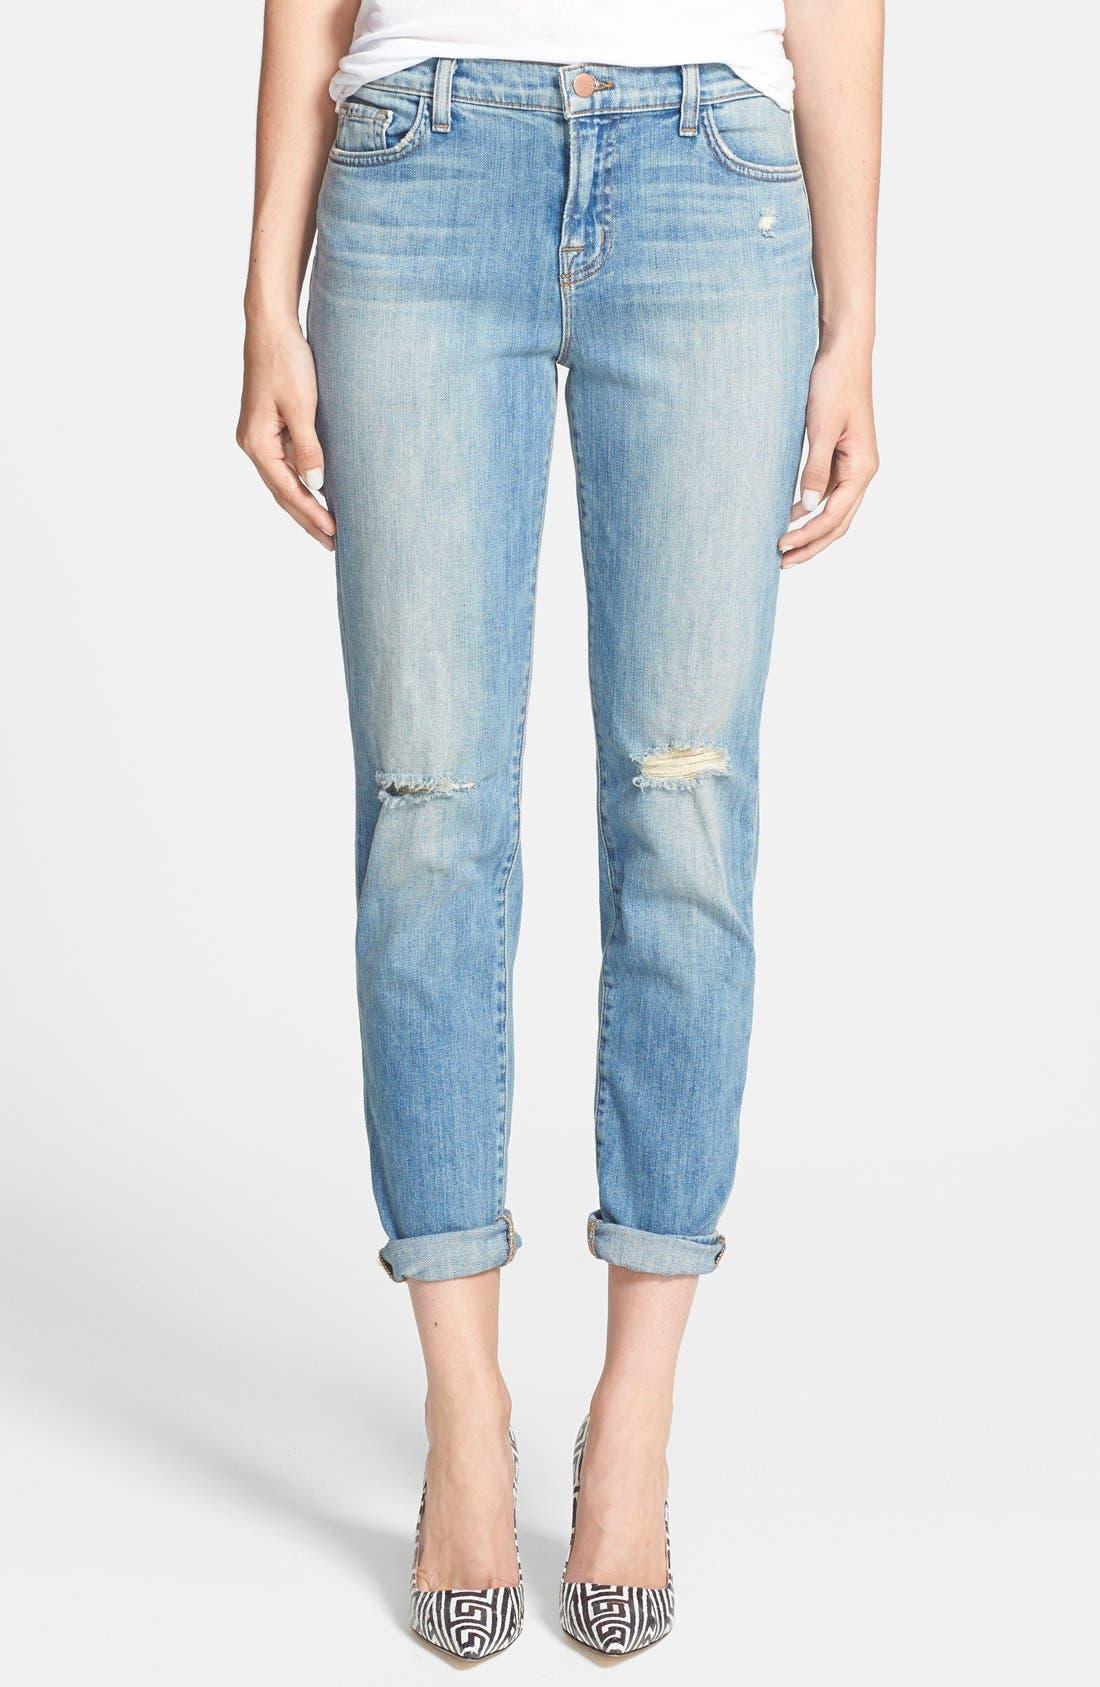 Alternate Image 1 Selected - J Brand 'Jake' Skinny Boyfriend Jeans (Landslide)